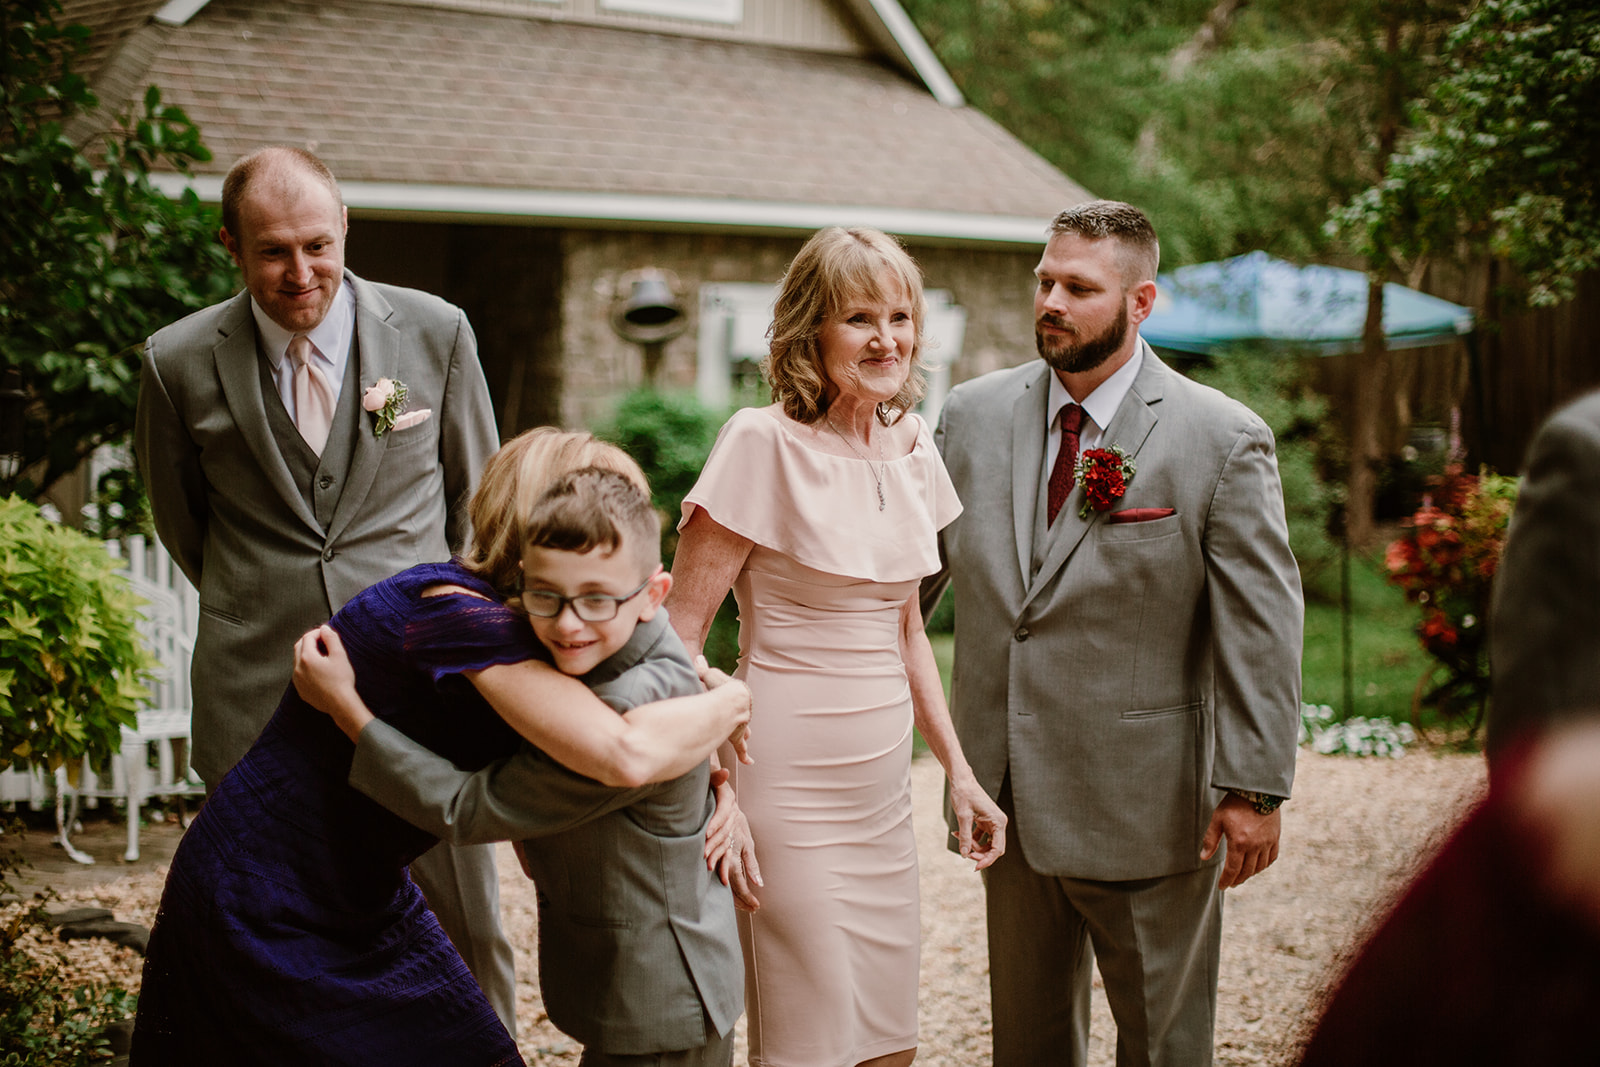 SarahMattozziPhotography-NicoleChris-GlenGardens-GettingReady-17.jpg